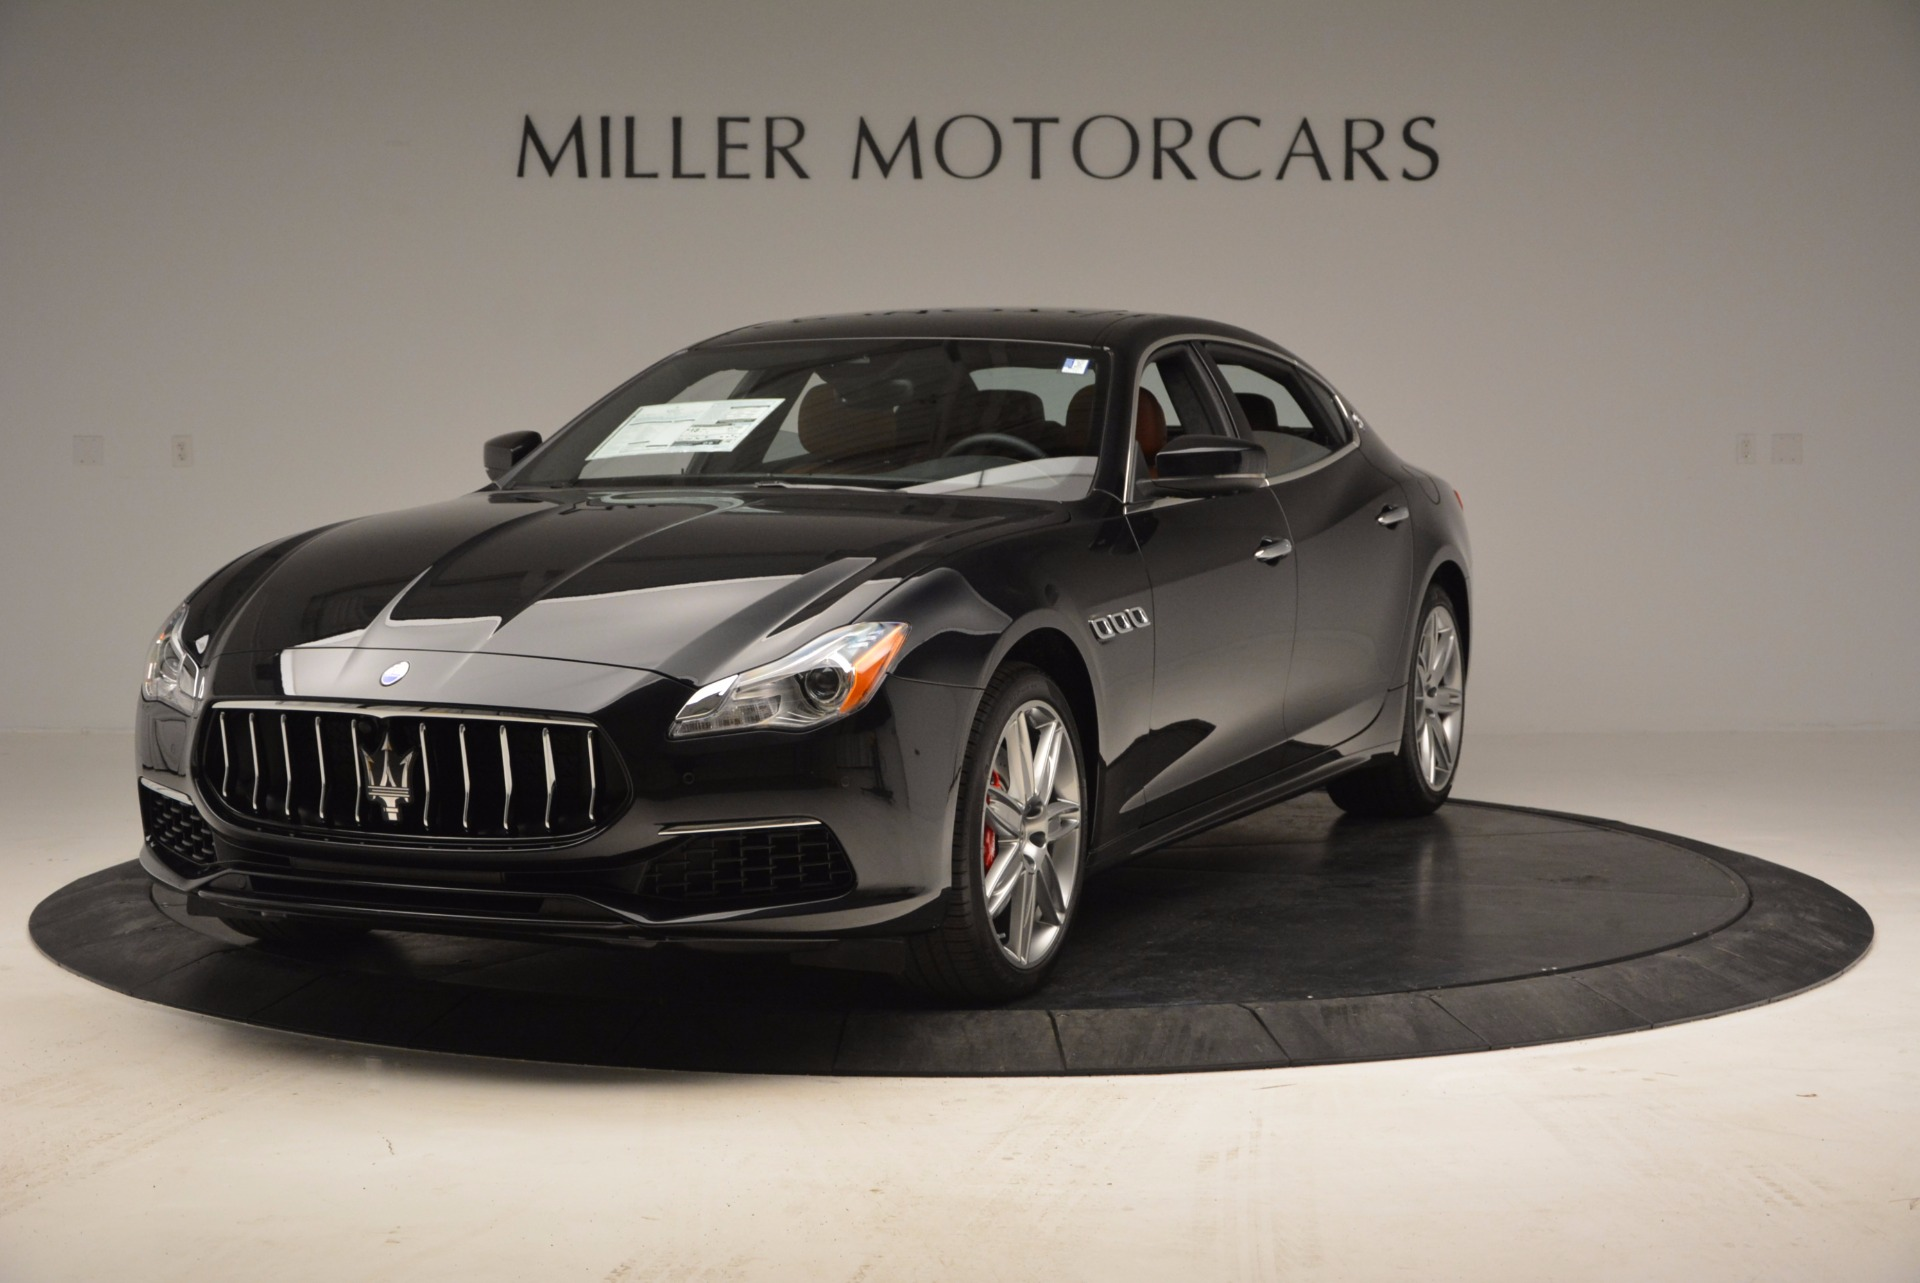 New 2017 Maserati Quattroporte S Q4 GranLusso For Sale In Westport, CT 716_main